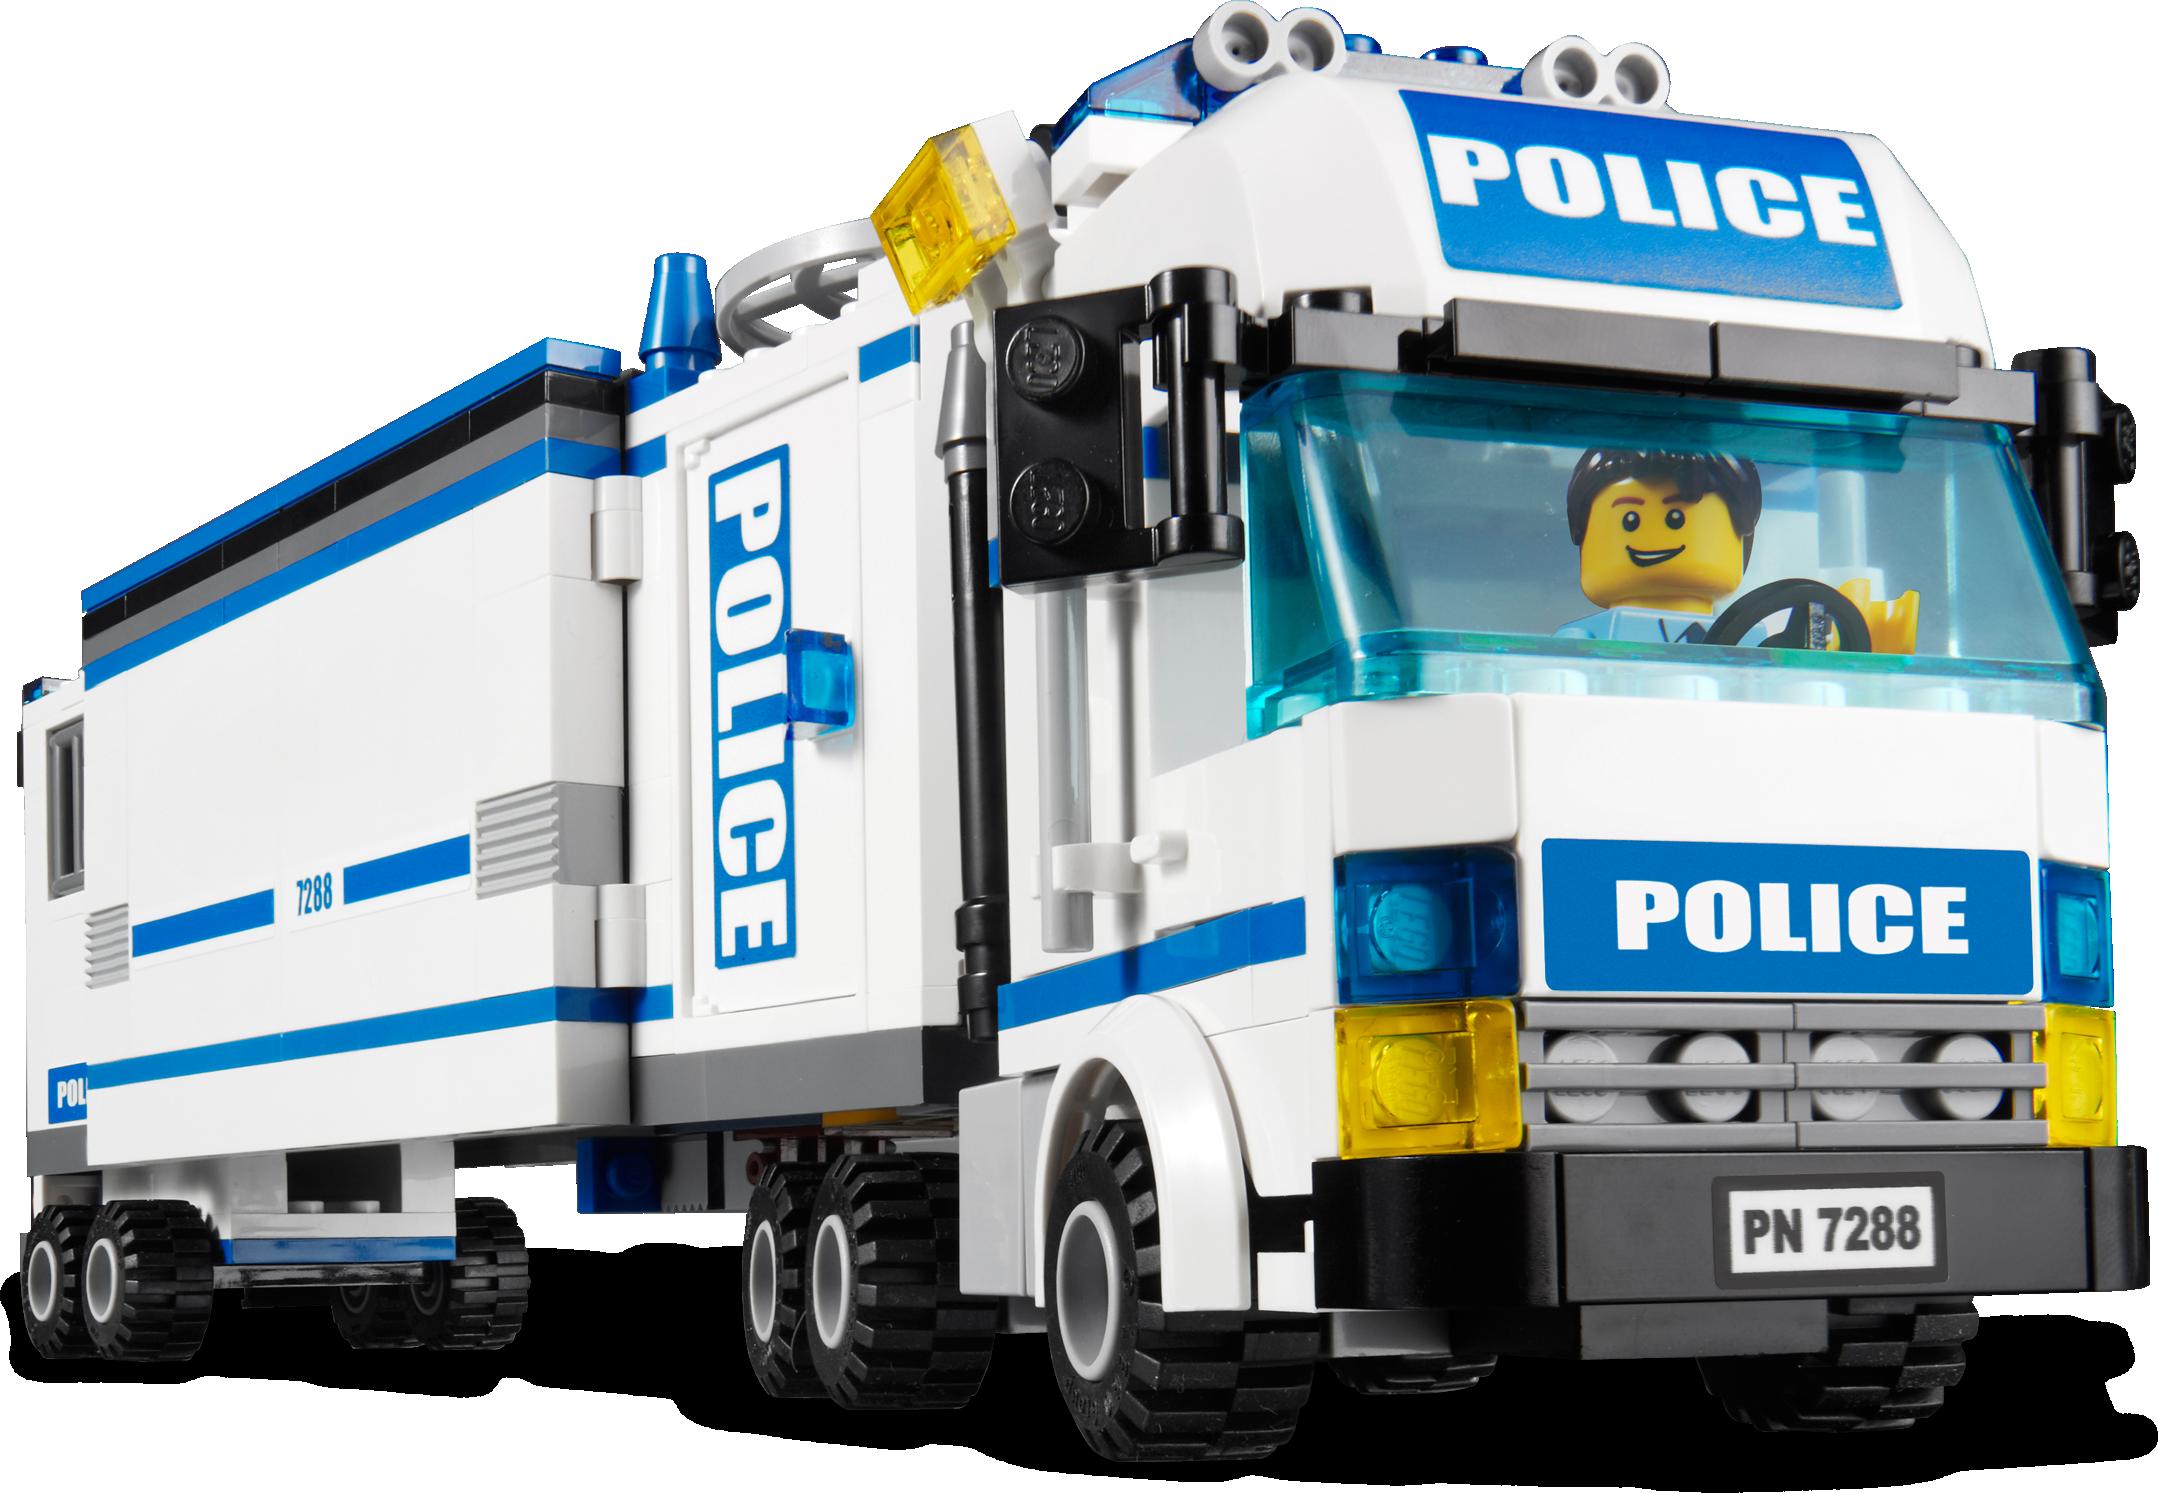 Mobile Police Unit